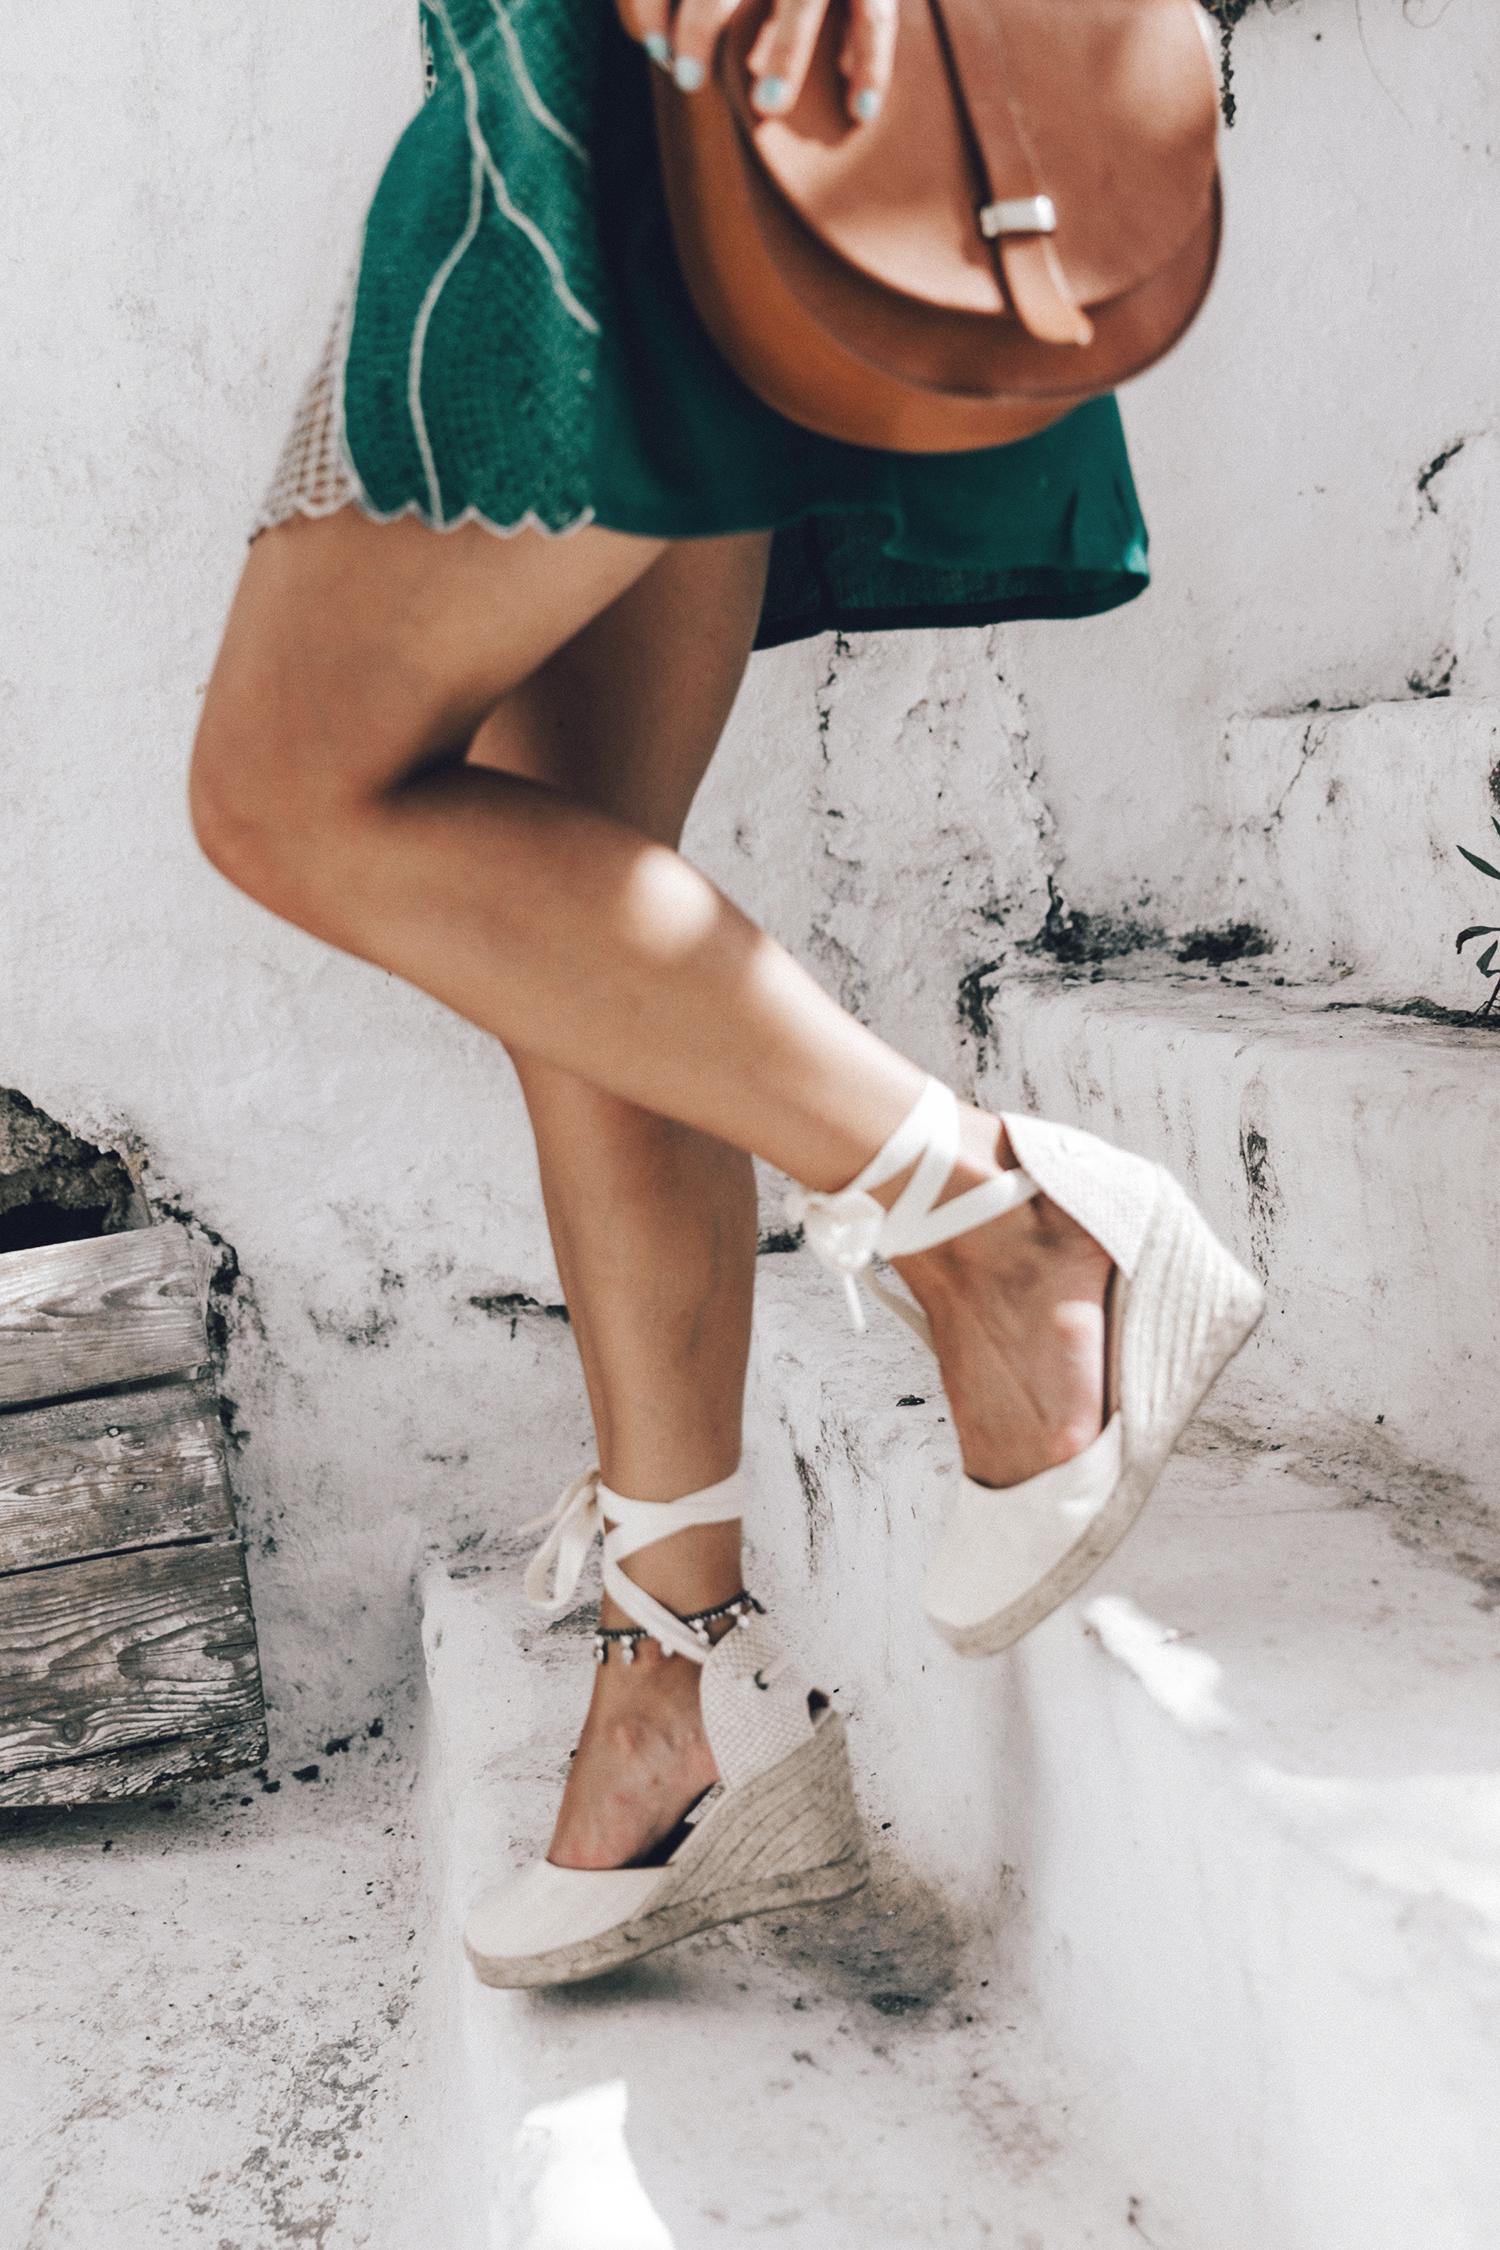 Tularosa_Dress-Soludos_Escapes-Soludos_Espadrilles-Sezane_Bag-Leather_Crossbody_Bag-Boho_Outfit-Look-Ray_Ban-Street_Style-Mykonos-Greece-Collage_Vintage-13